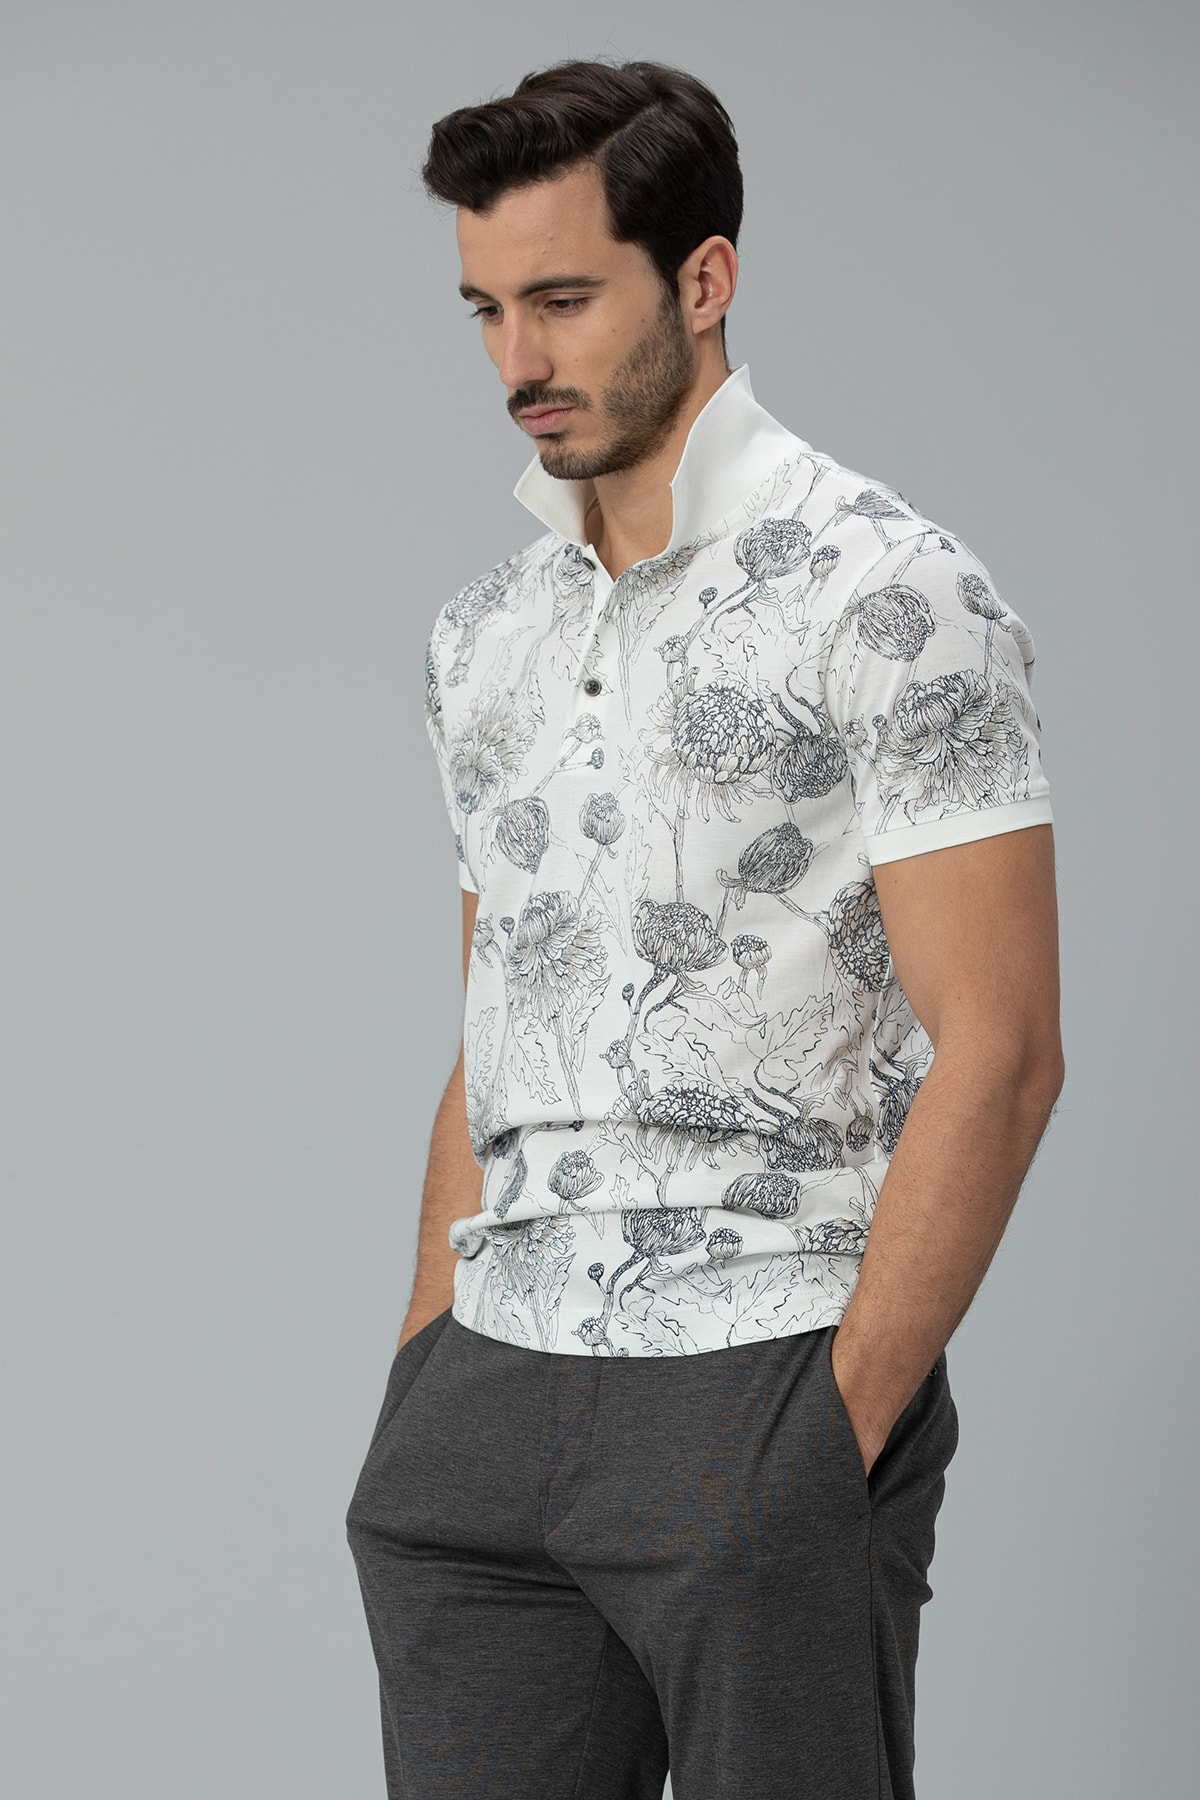 Lufian Capri Spor Polo T- Shirt Kırık Beyaz